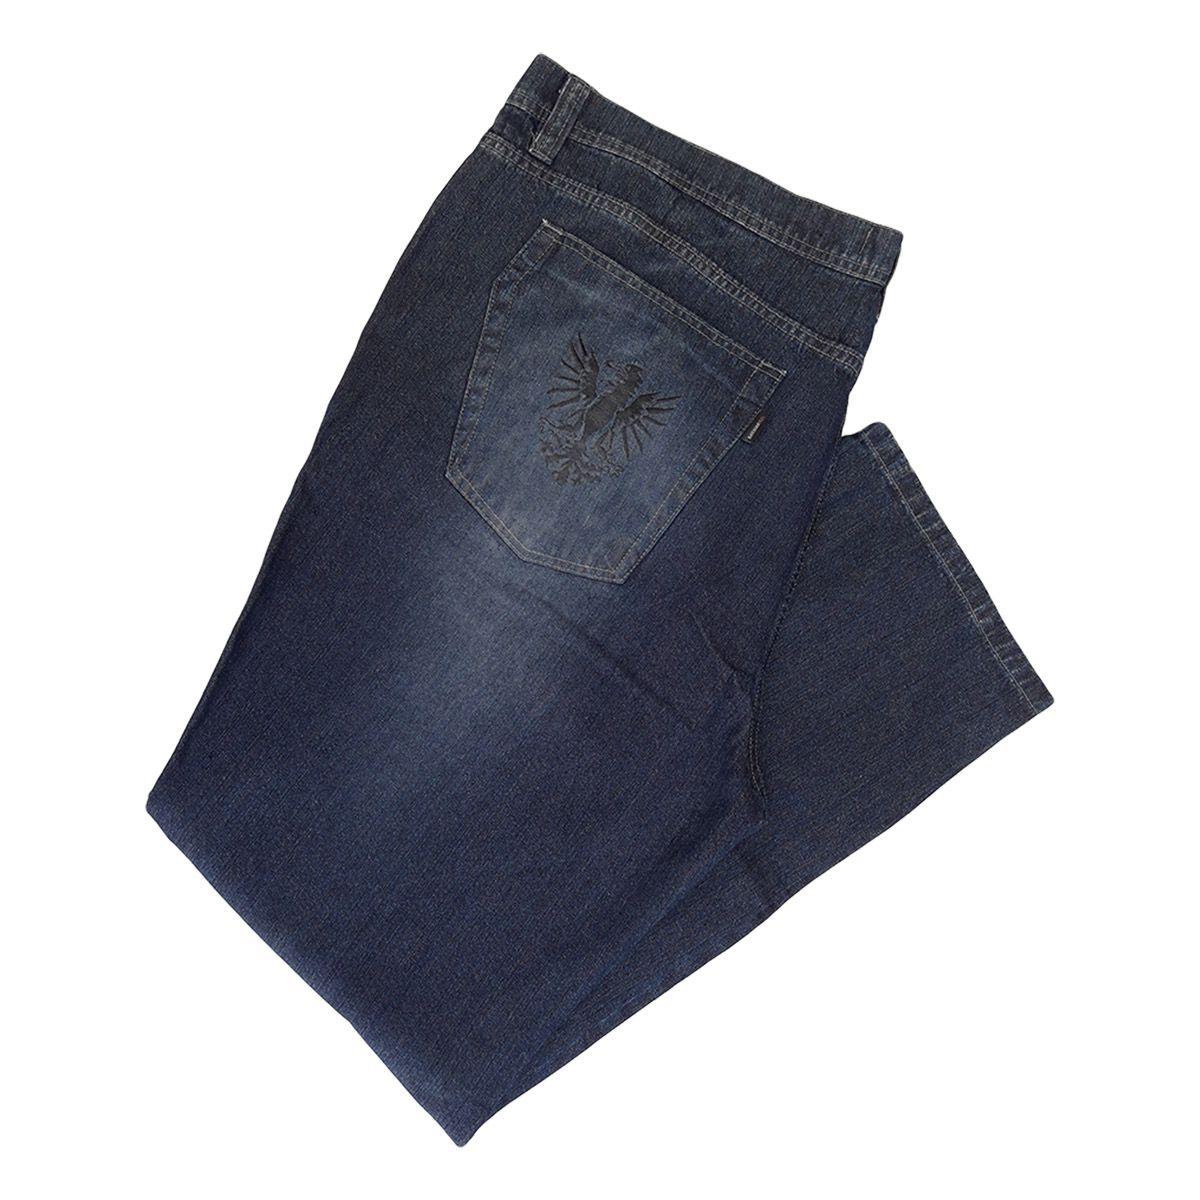 Kit C/ 02 Calças Jeans Masculinas Plus Size Tamanho 60